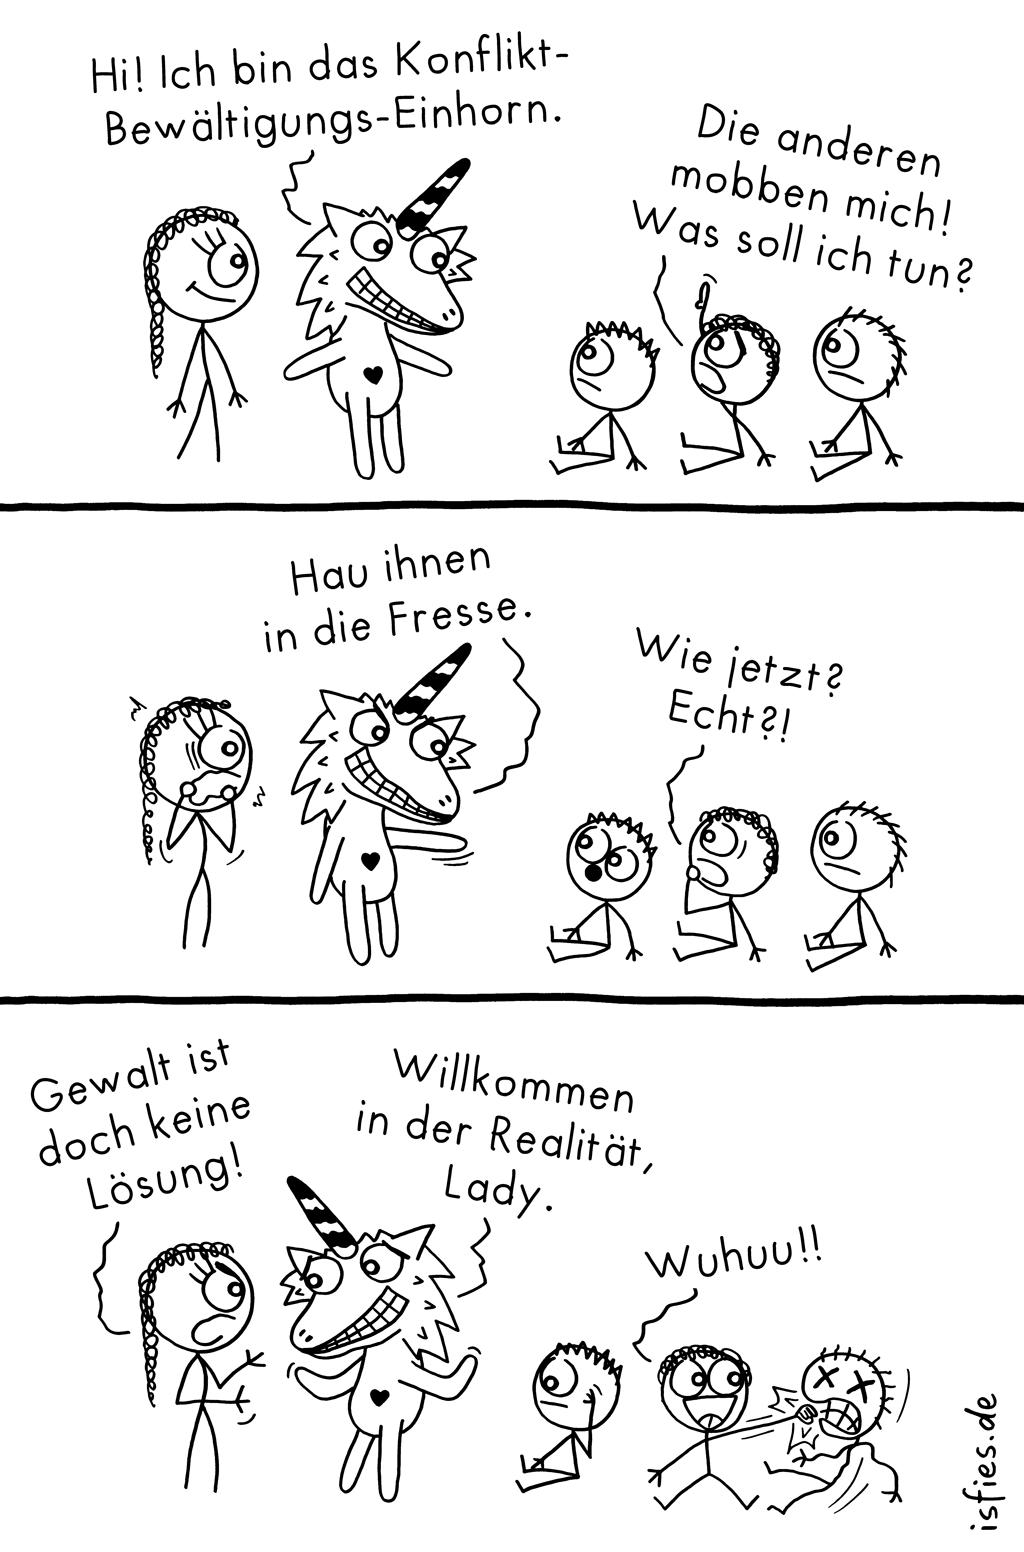 Konflikt-Bewältigungs-Einhorn | Is fies!